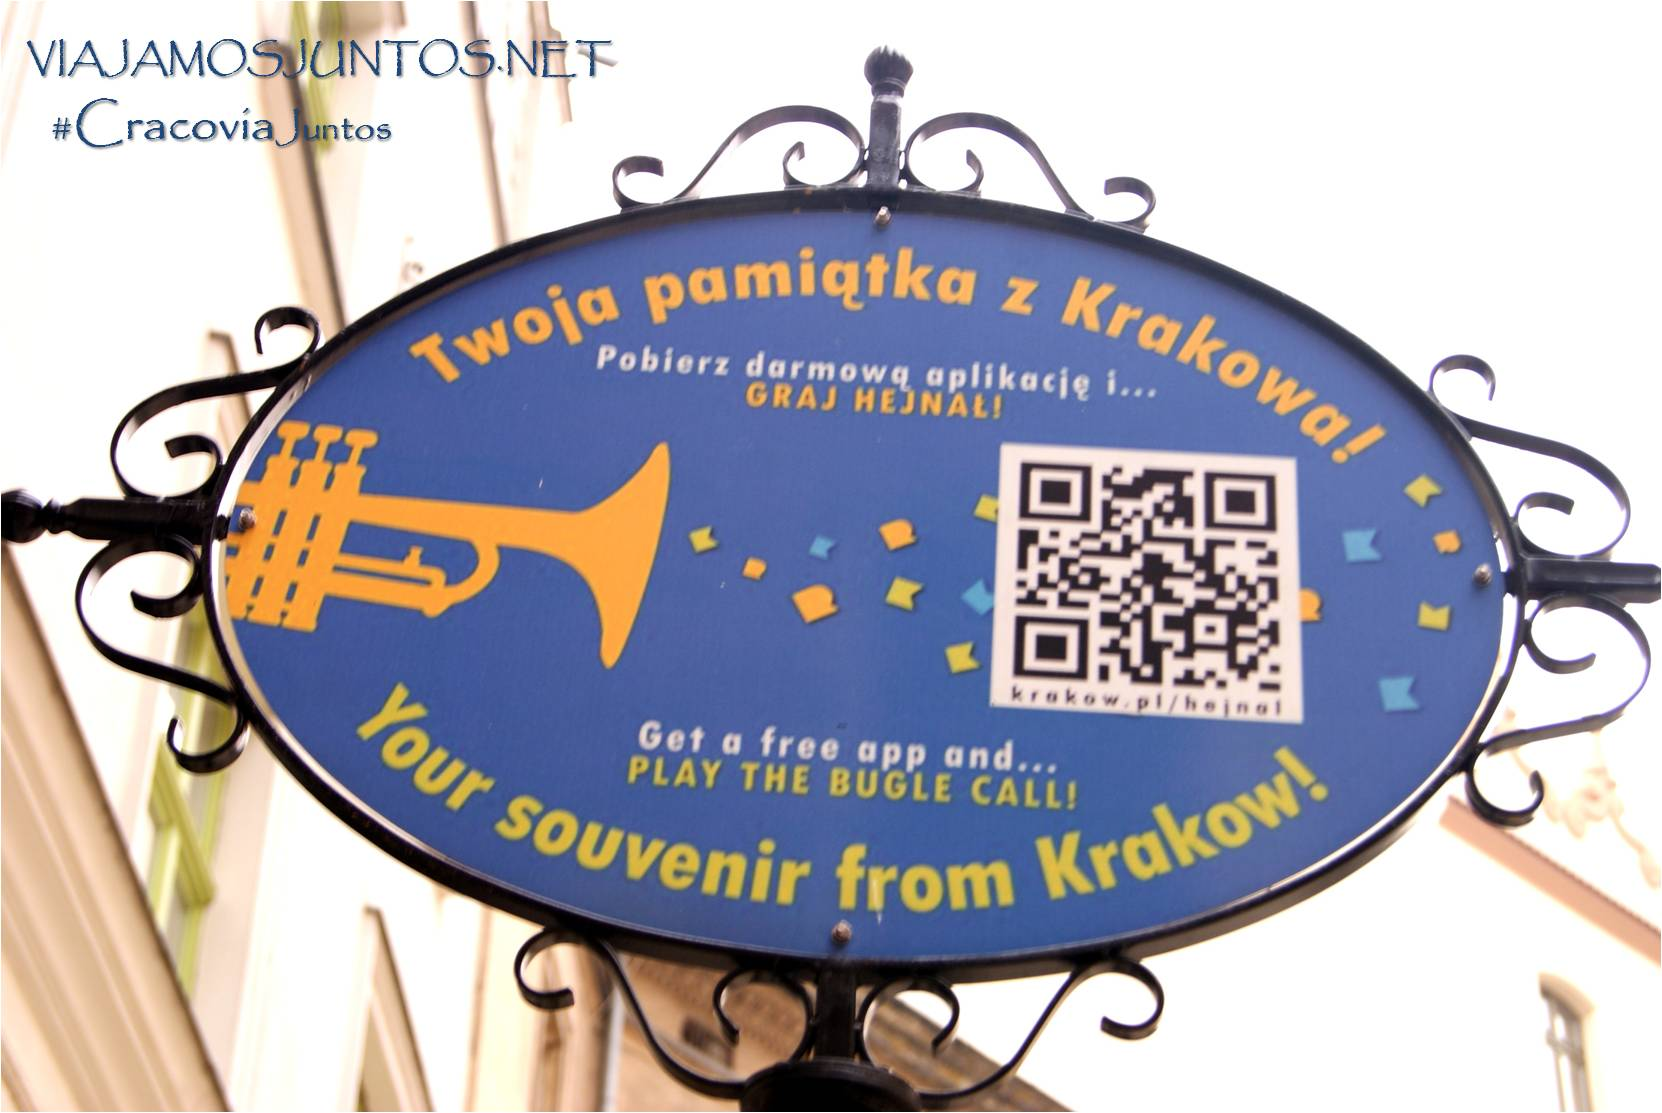 Cracovia, Polonia, Poland, Krakow, viajar por libre, escapadas, guia practica, tiempo, wifi